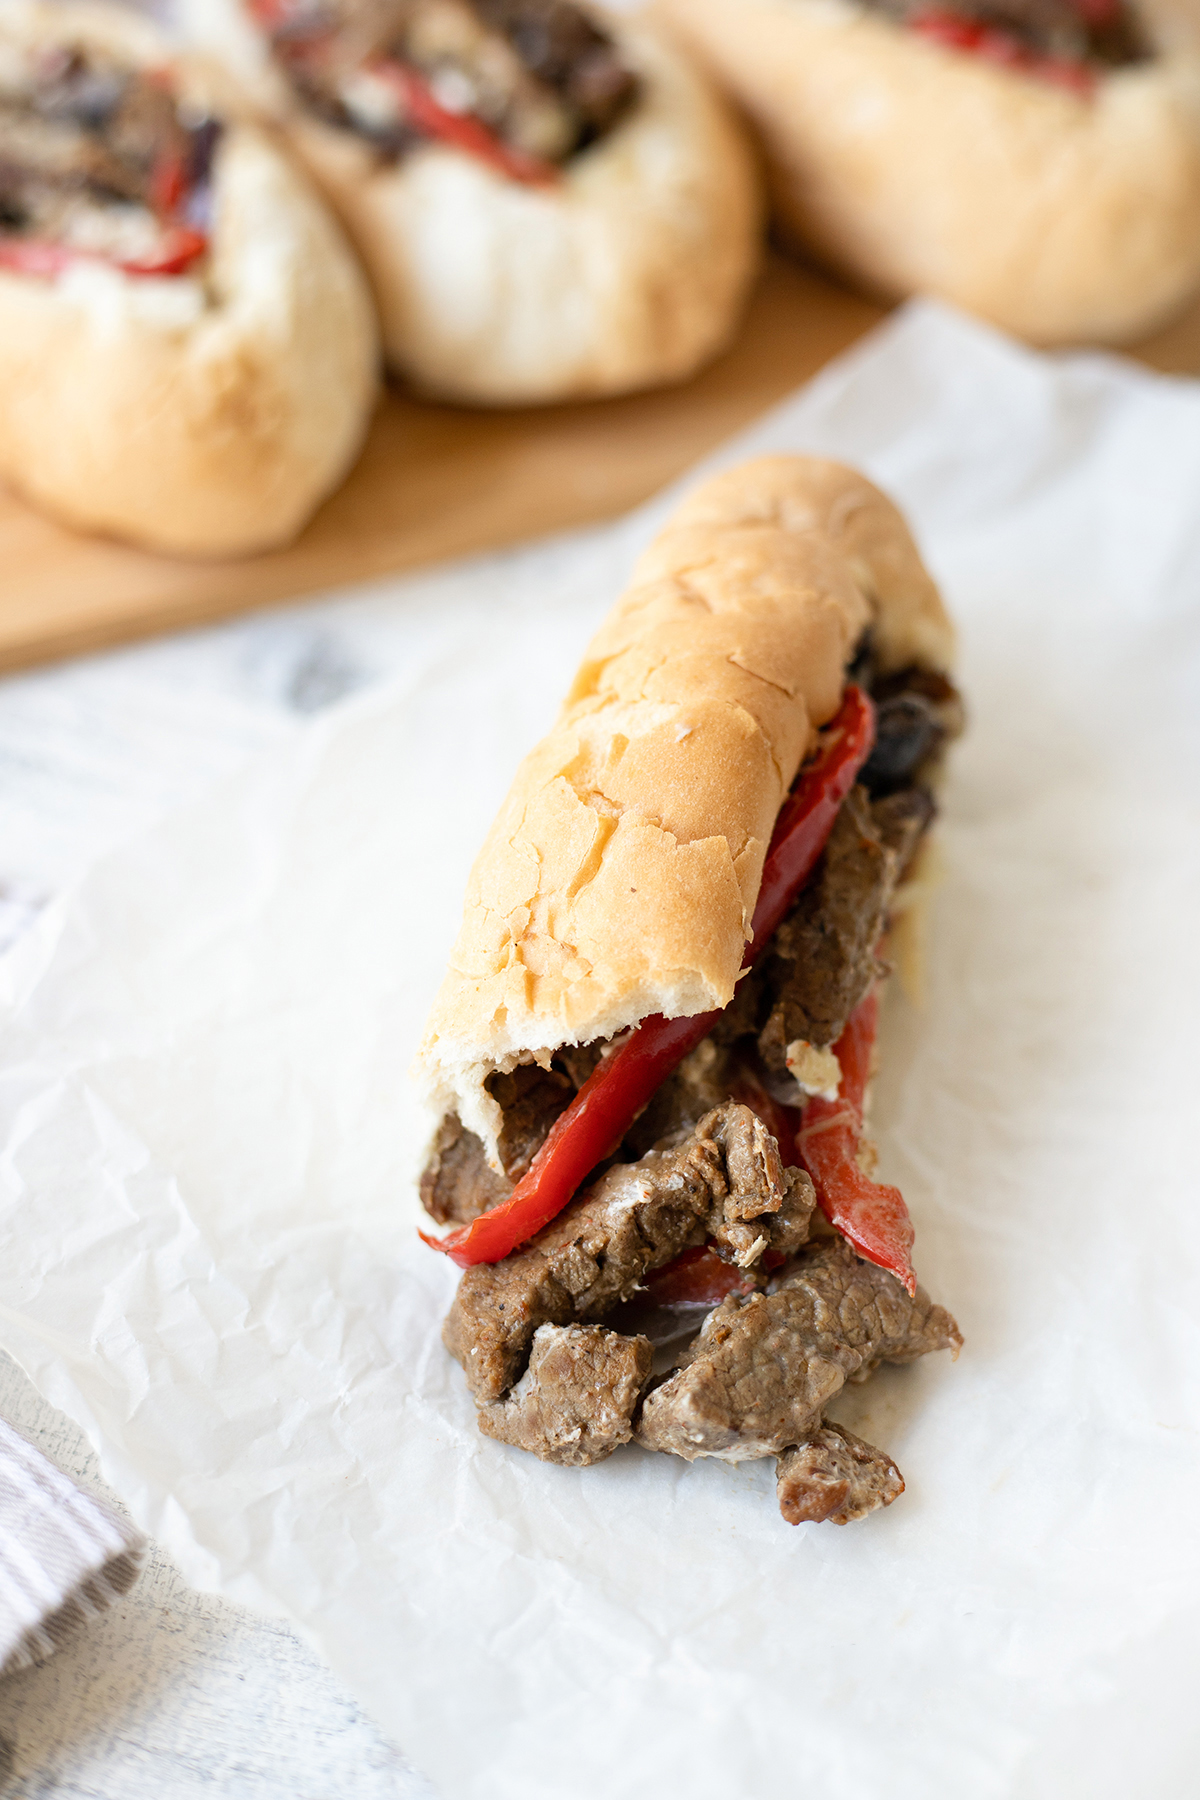 Philly Cheesesteak #Phillycheesesteaksandwich #EasySandwich #phillycheesesteakrecipe #lunchrecipes #bestphillycheesesteak